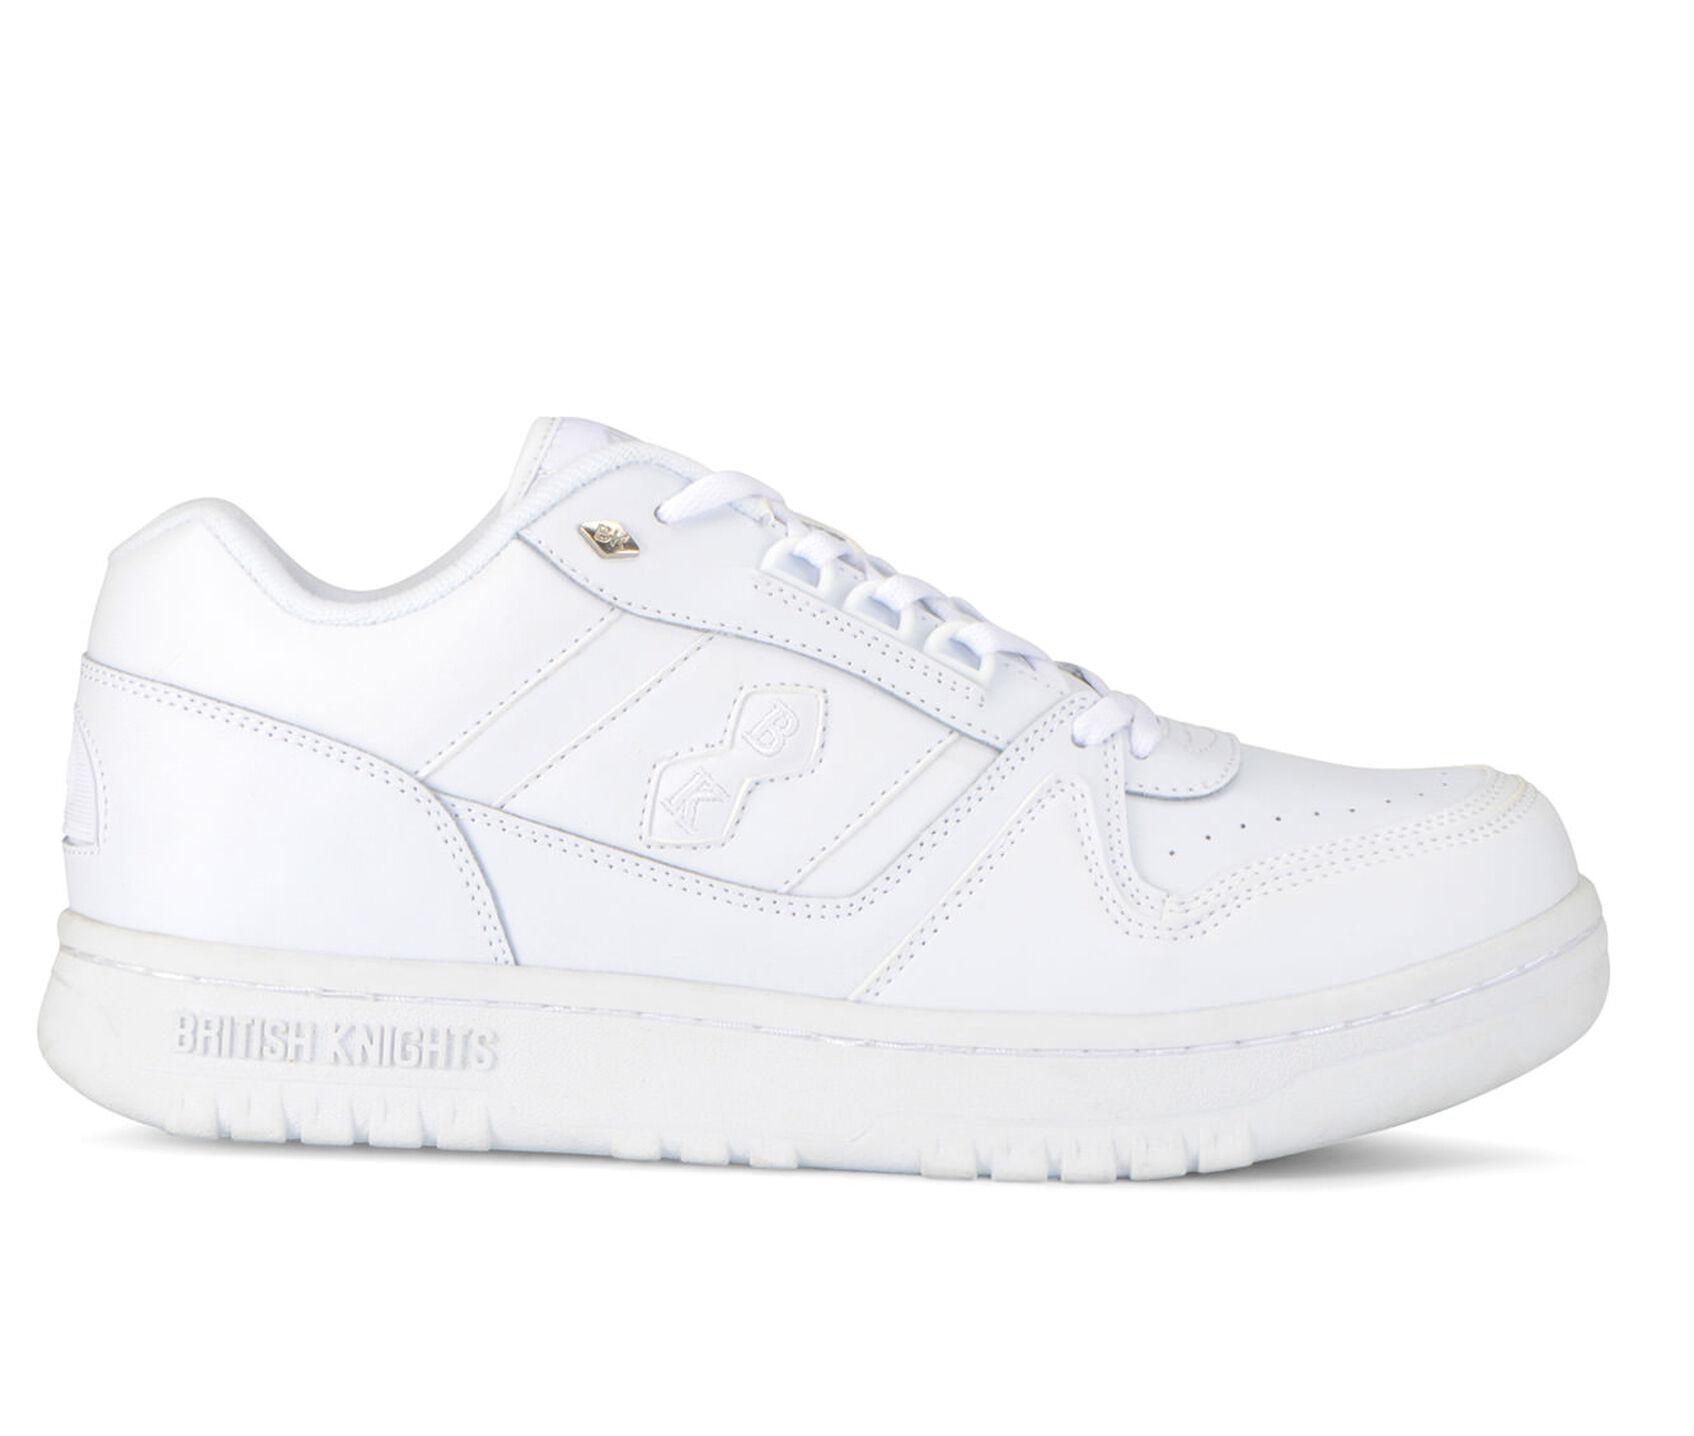 56c64077d44f Men s British Knights Kings SL Low Retro Sneakers